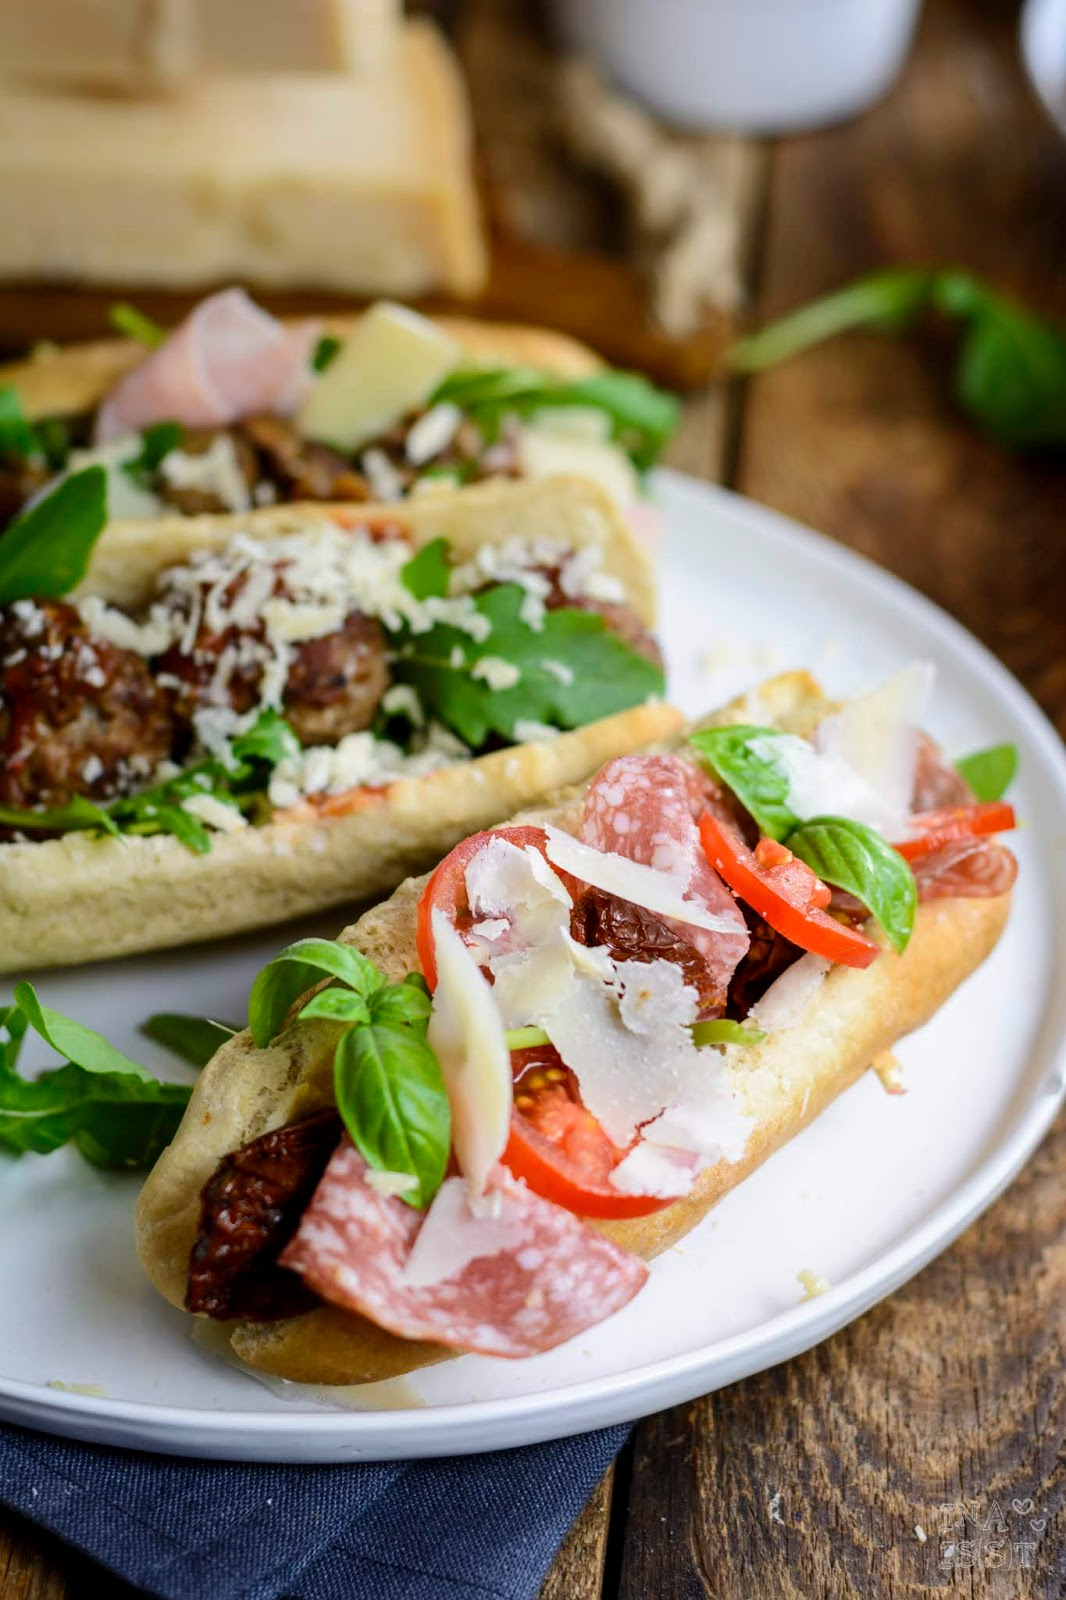 Hot Dog Rezepte Italien, Parmigiano Reggiano, Italian Hot Dog